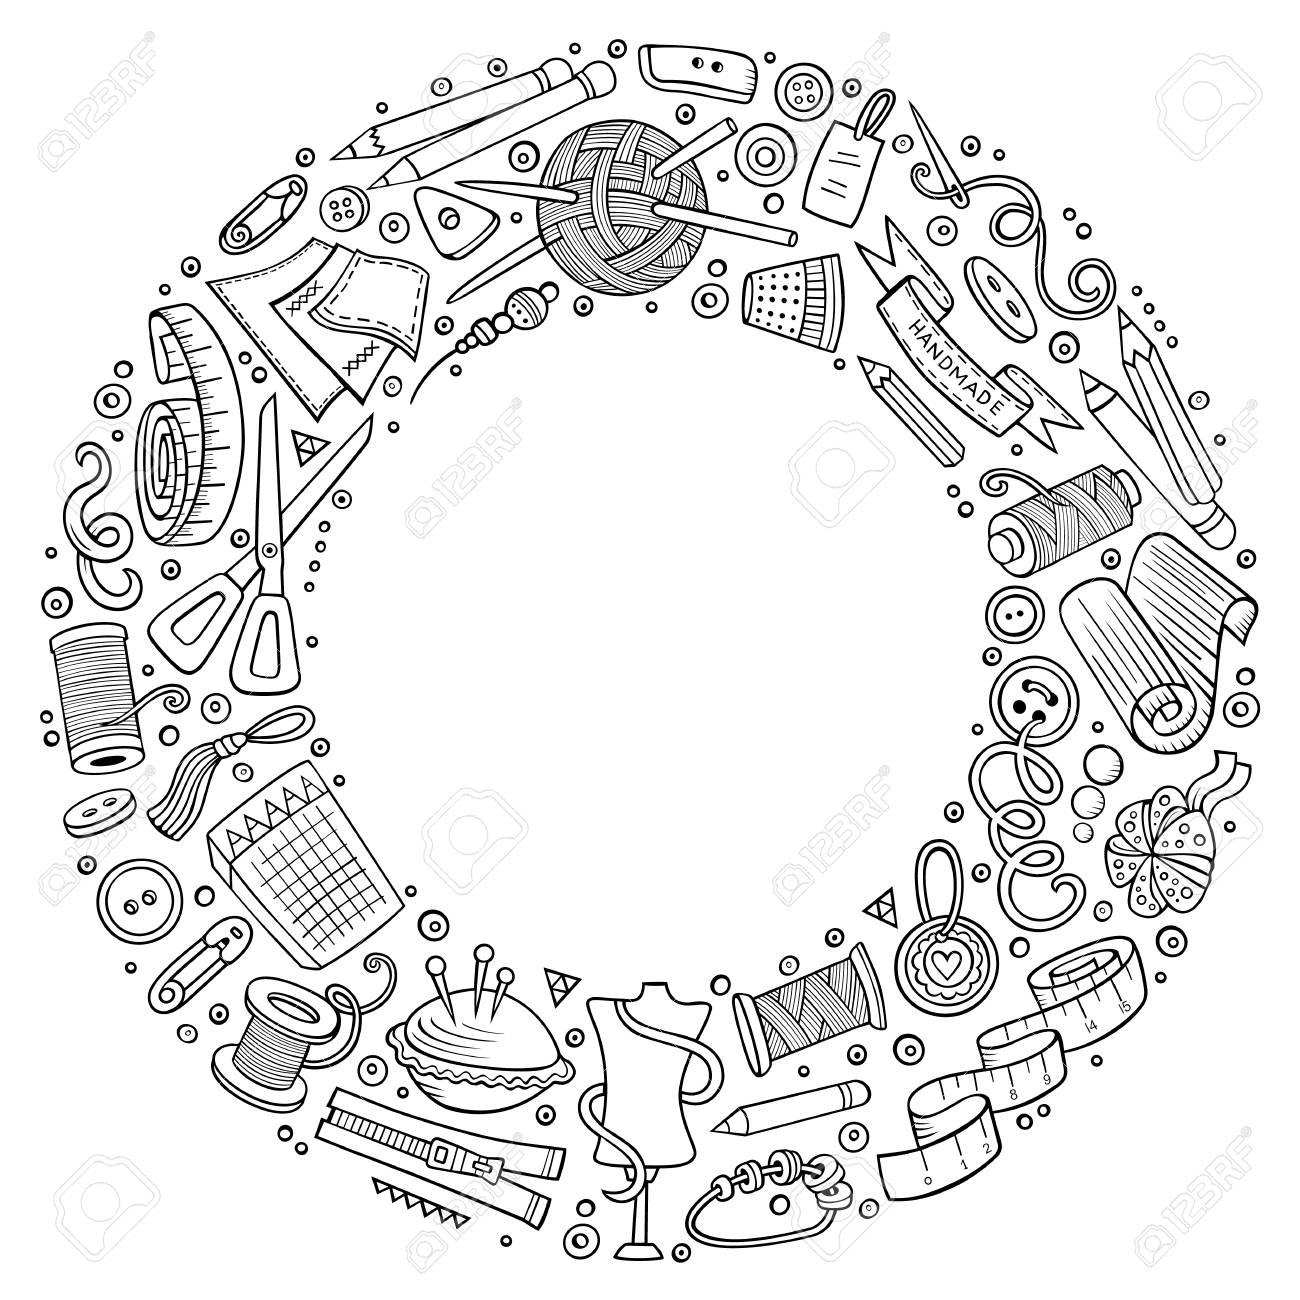 Set of handmade cartoon doodle objects, symbols and items. - 95462325